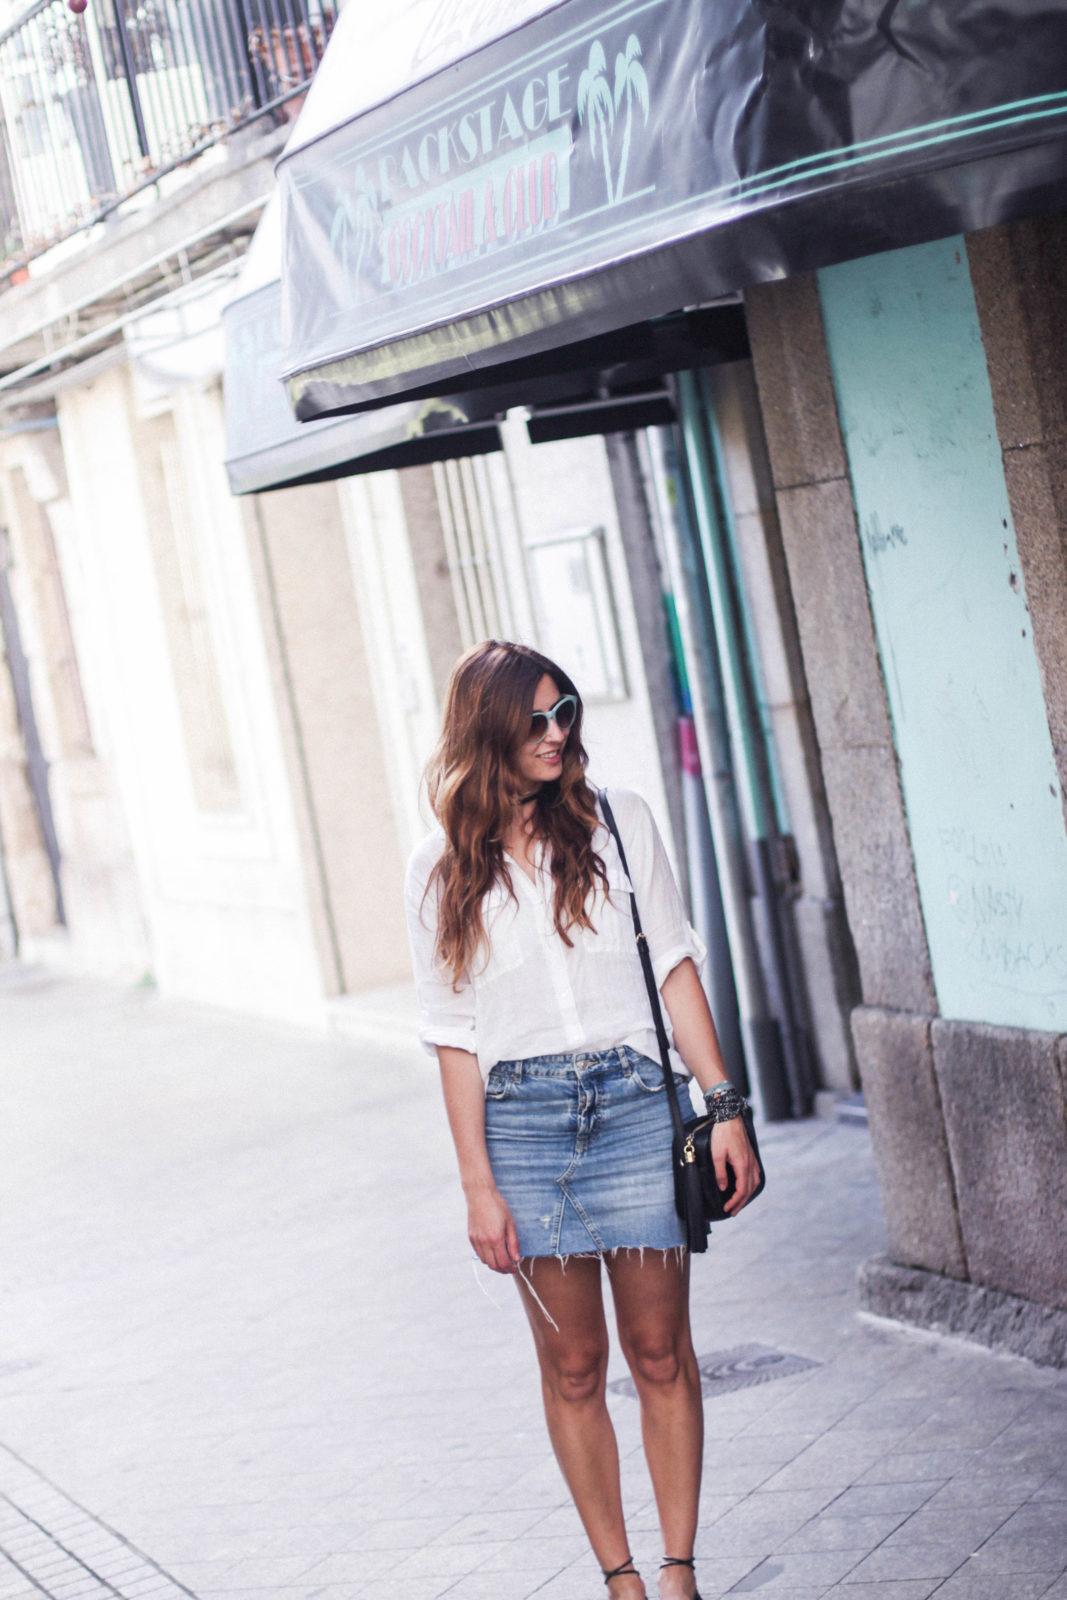 denim_skirt_falda_vaquera_camisa_blanca_alpargatas_espadrilles_look_summer_2016_street_style-3